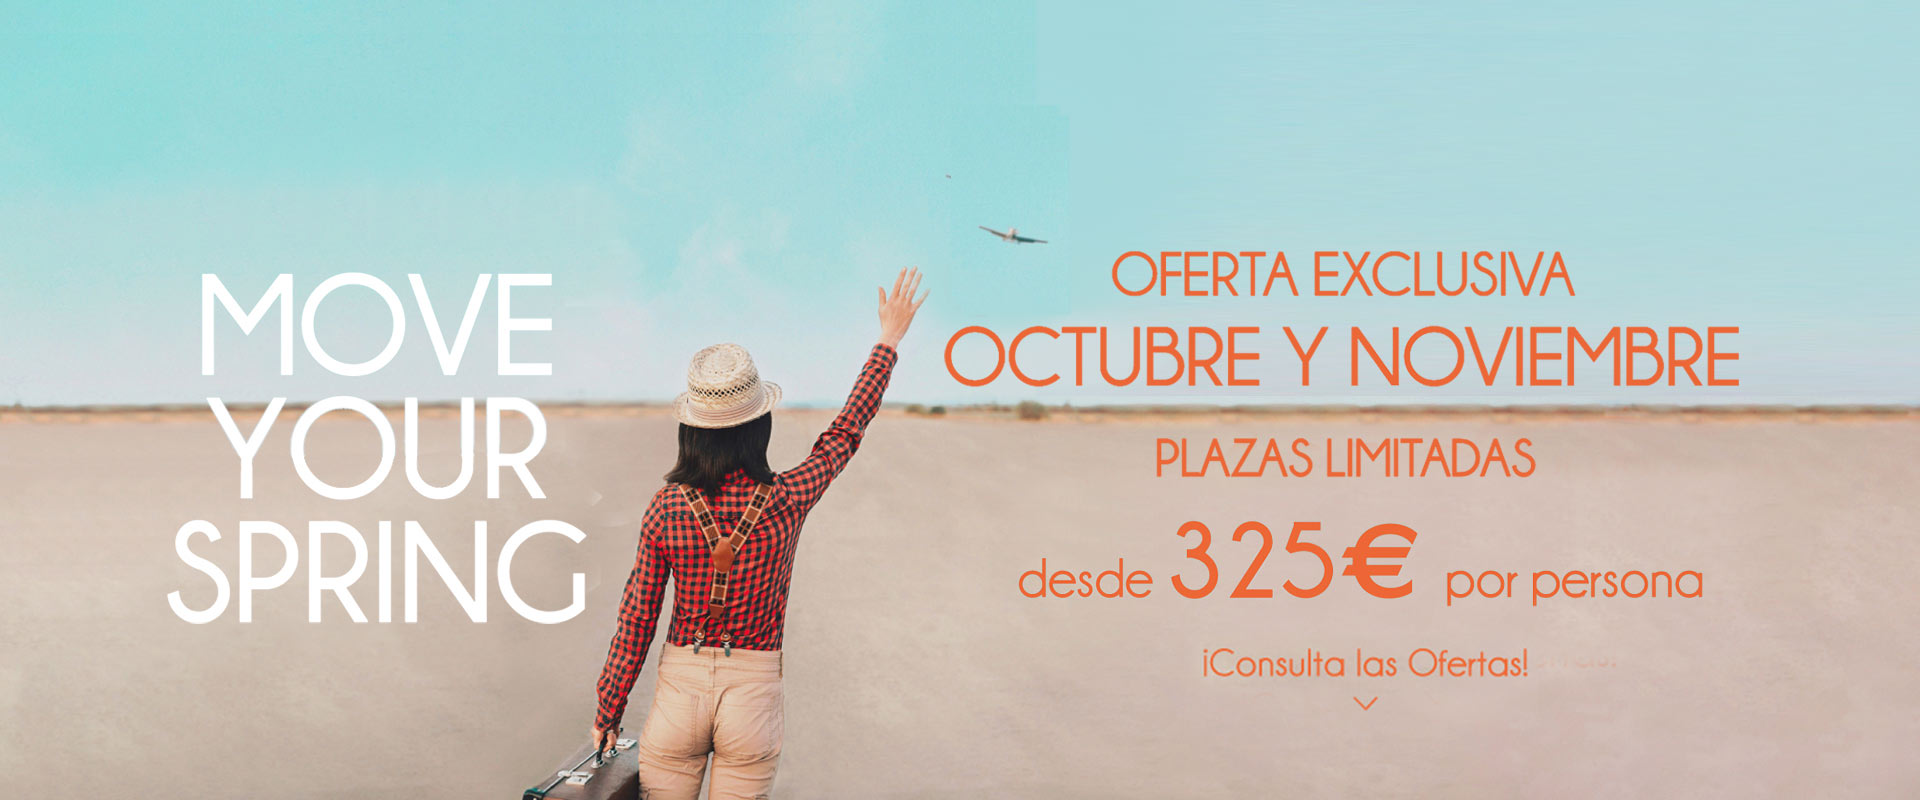 Campaña-Oferta_SLIDER-OTONO_ES